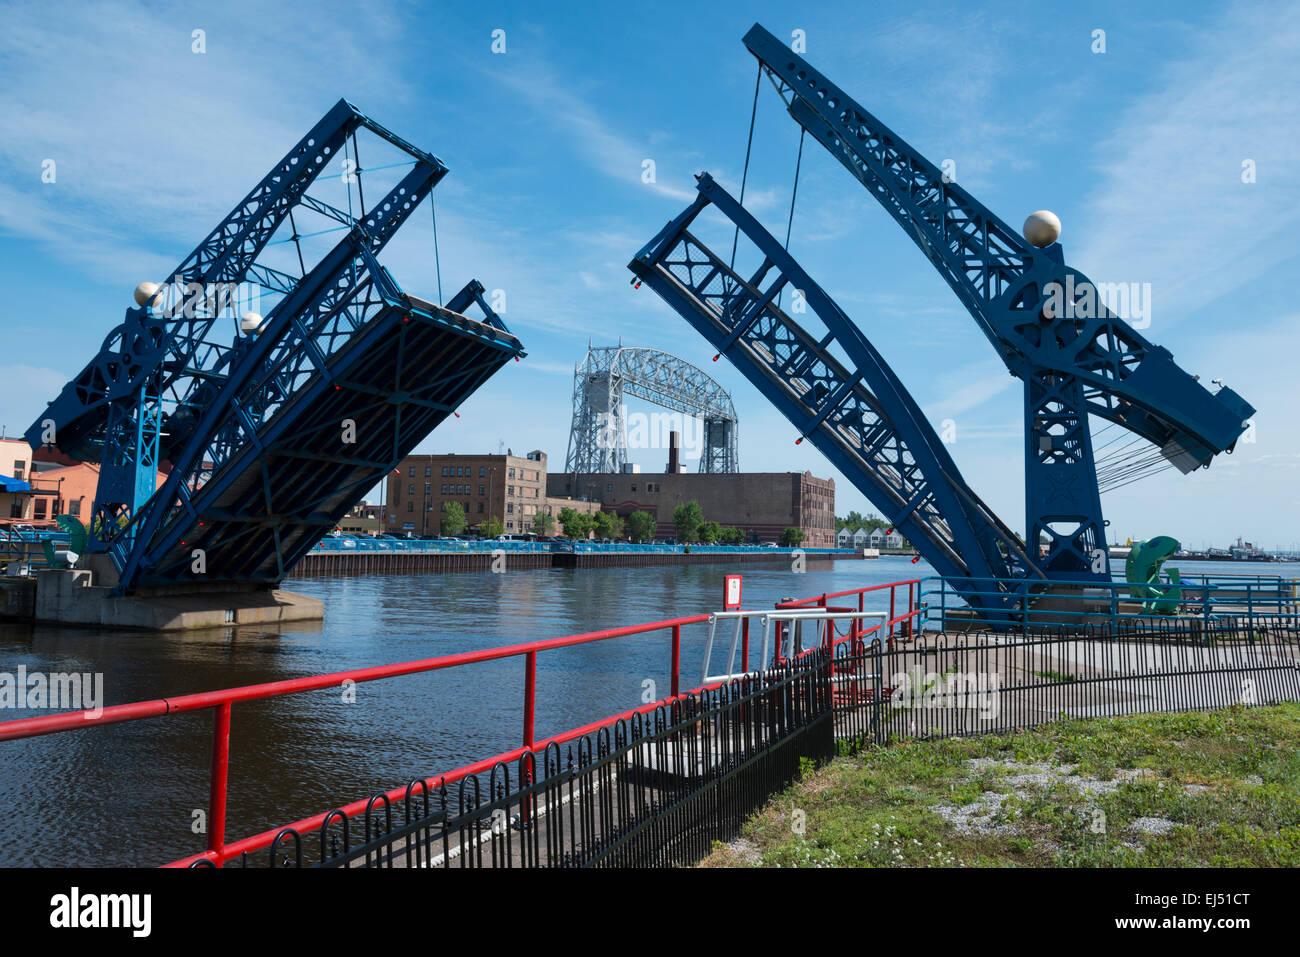 Slip-Zugbrücke. Hafen von Duluth. Lake Superior. Minnesota. USA. Stockbild